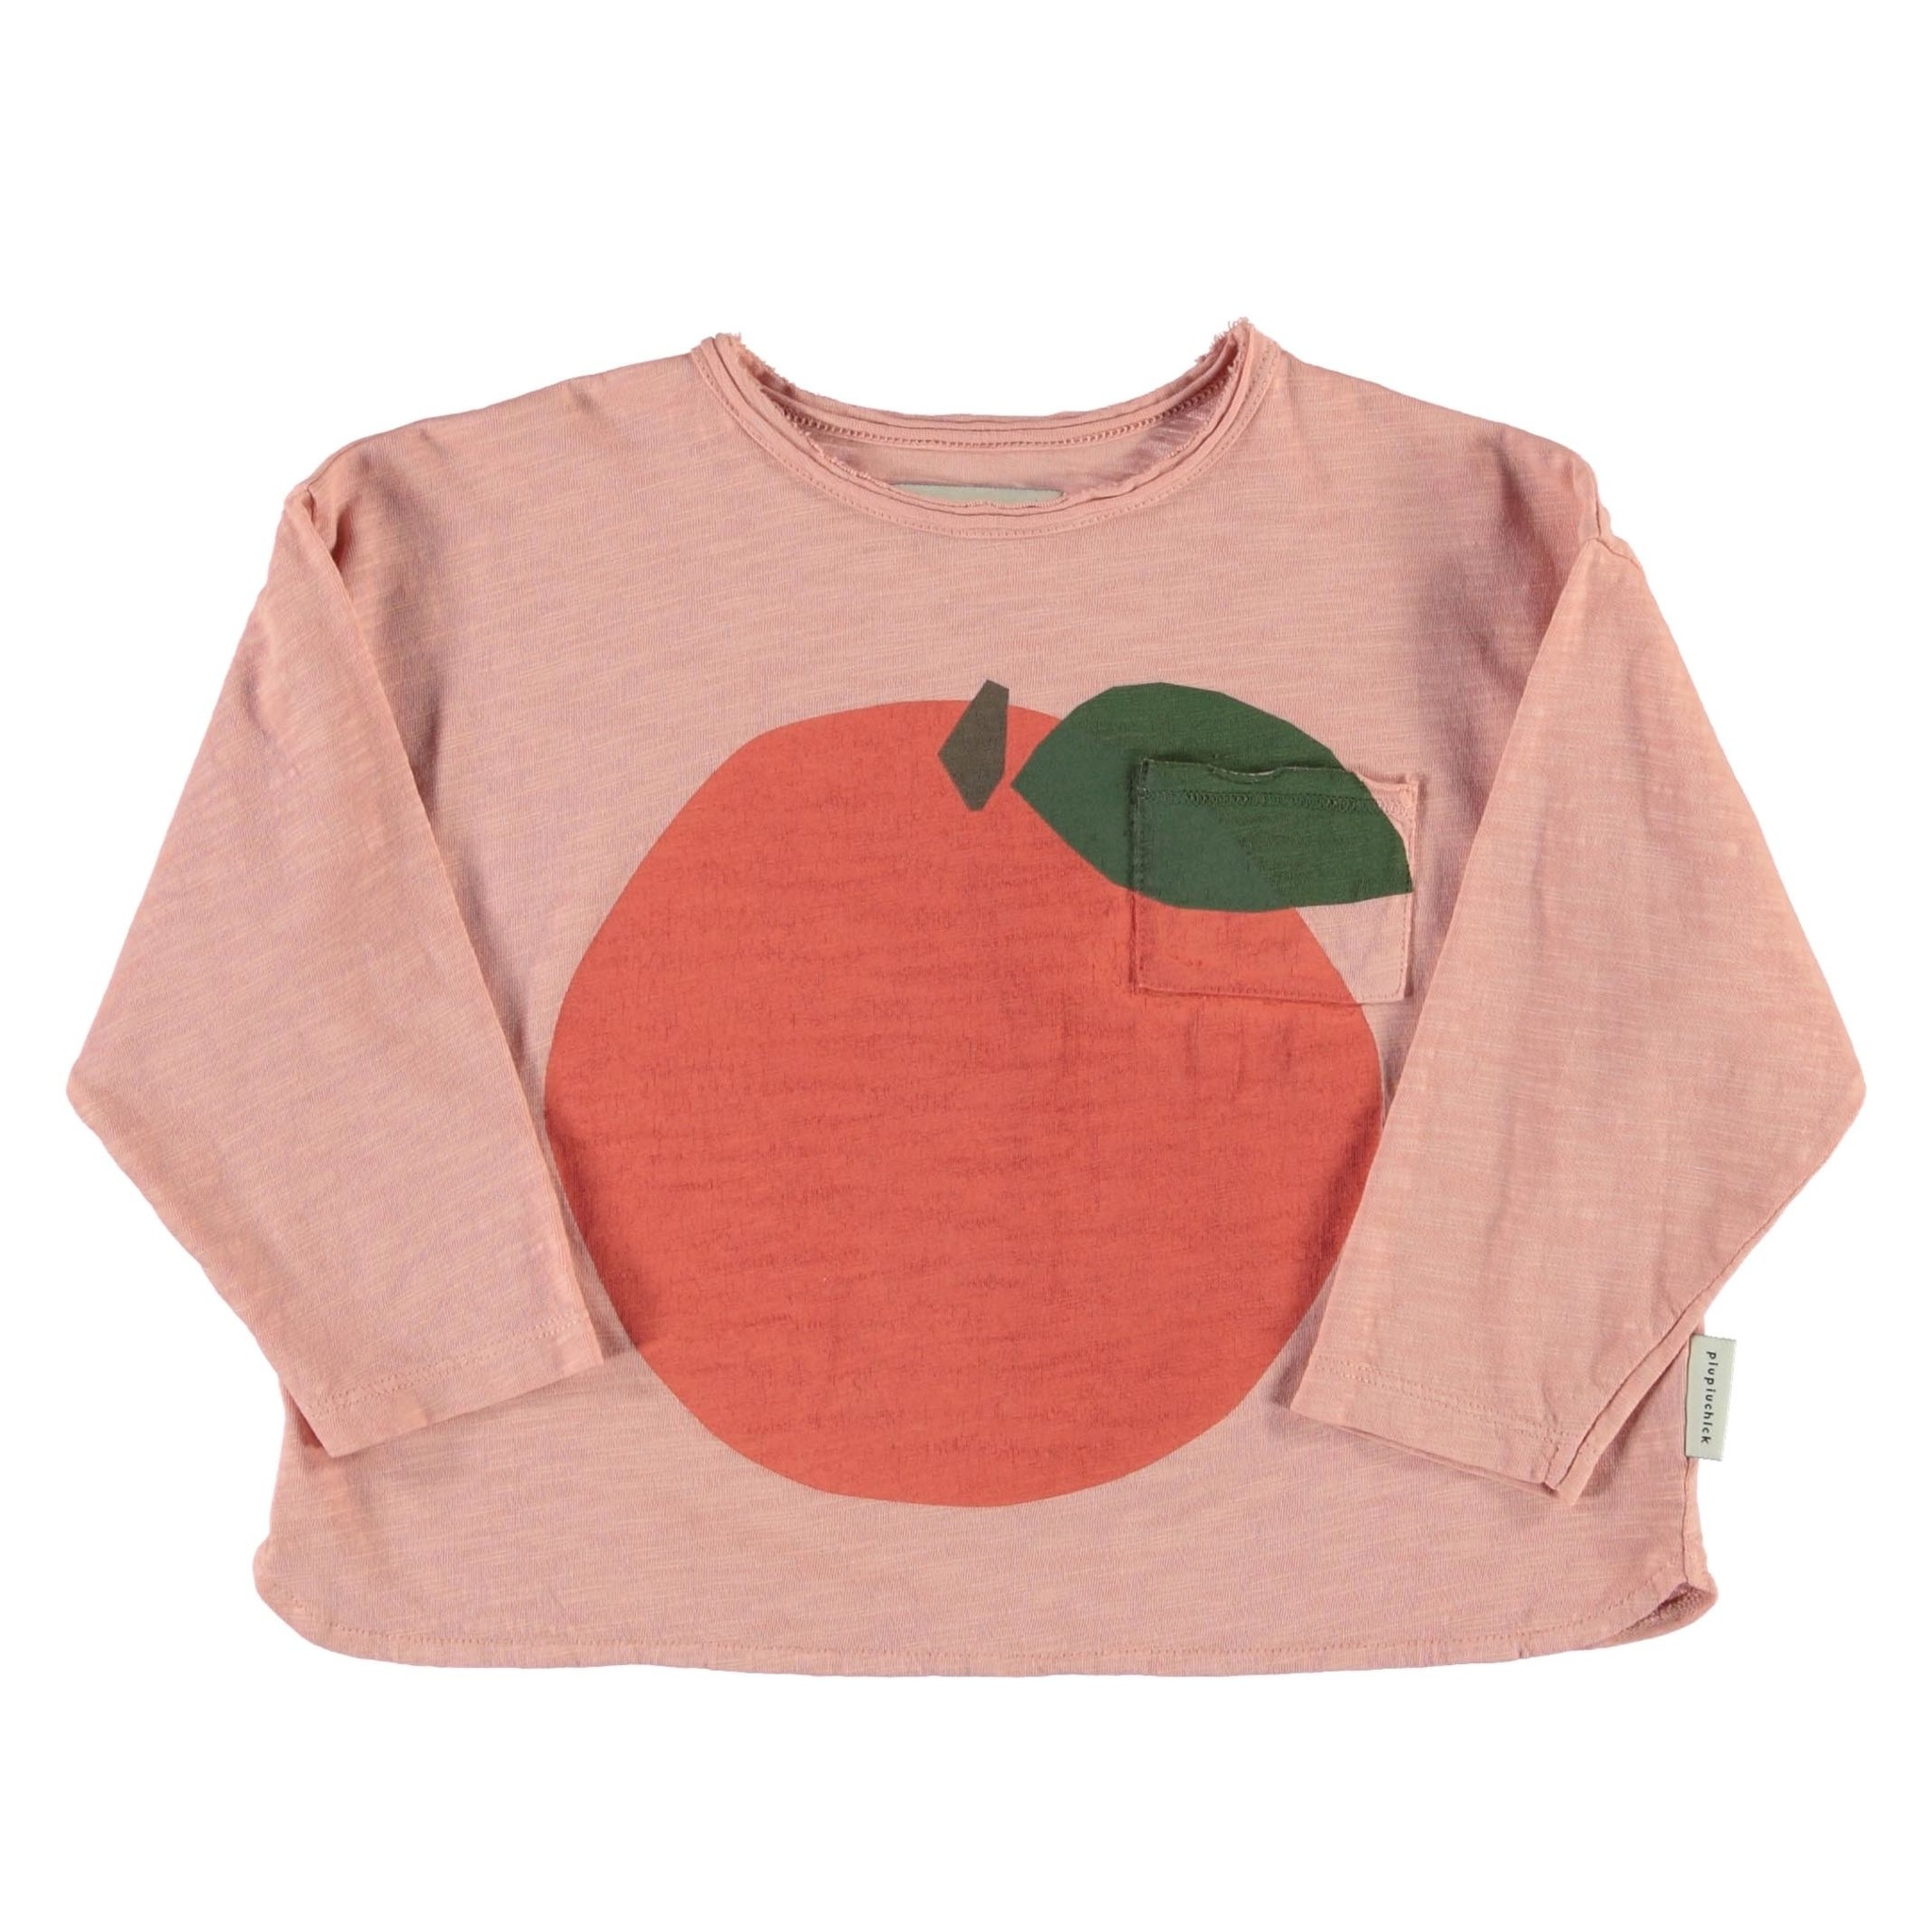 Longsleeve | light pink w/ peach print-1